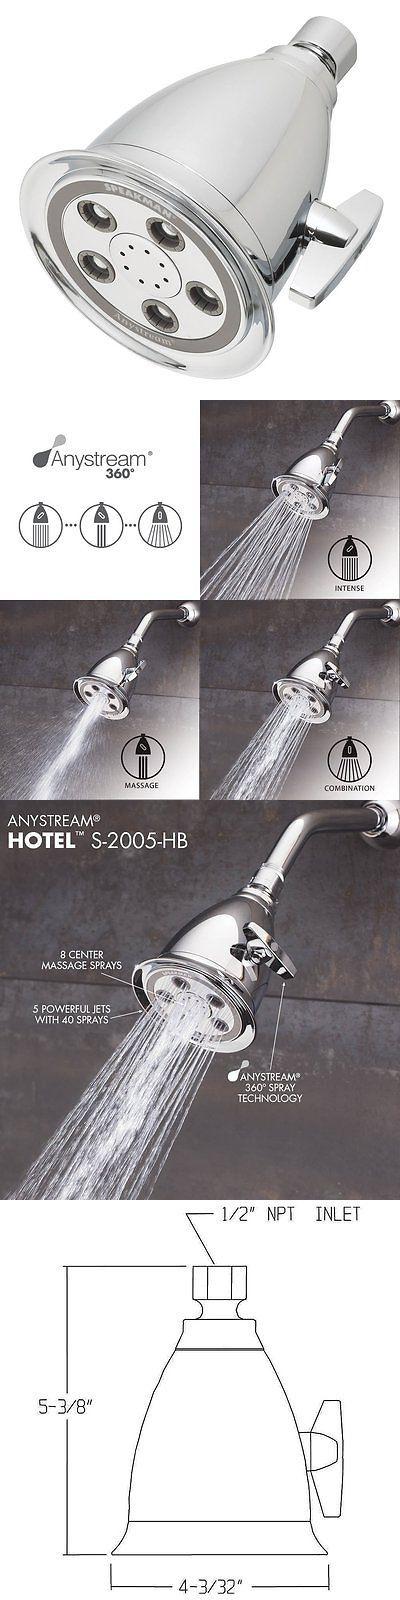 shower heads speakman s2005hb hotel anystream high pressure adjustable shower